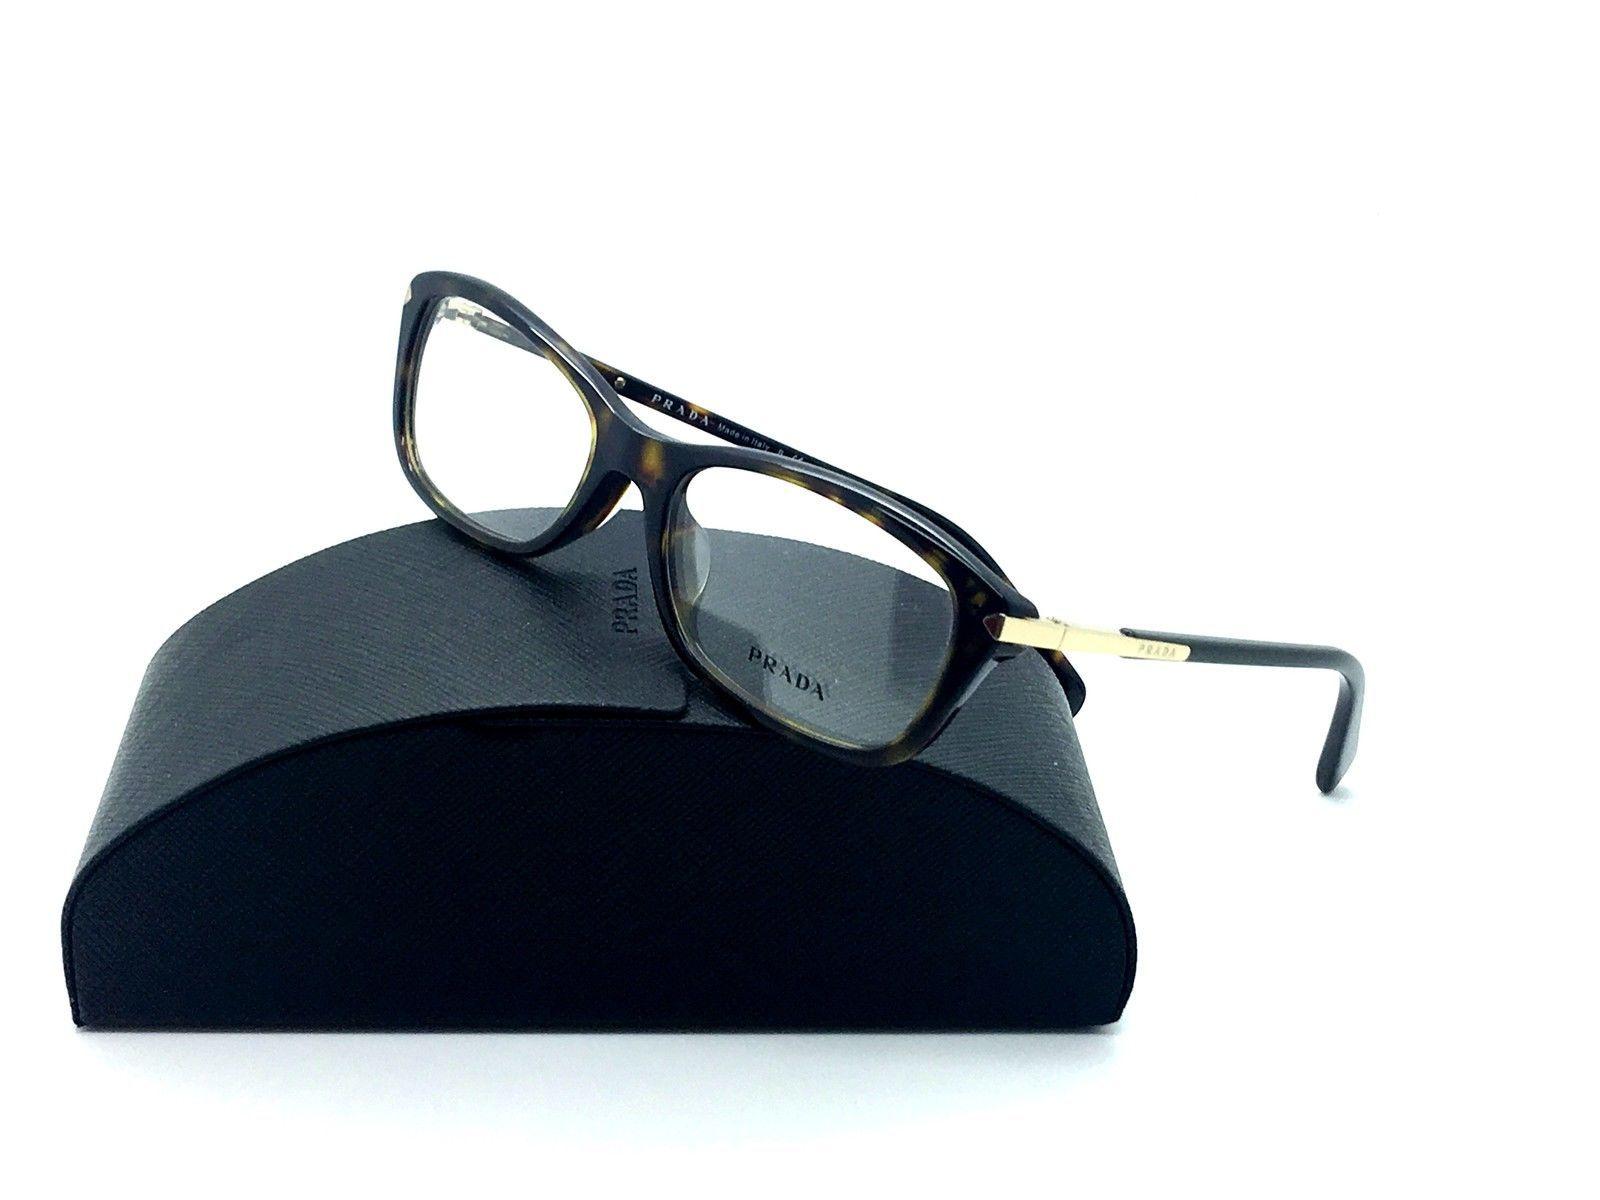 ad9d1da6389 S l1600. S l1600. Prada Tortoise Eyeglasses VPR 04P 2AU 1O1 54 mm Demo  Lenses Italy